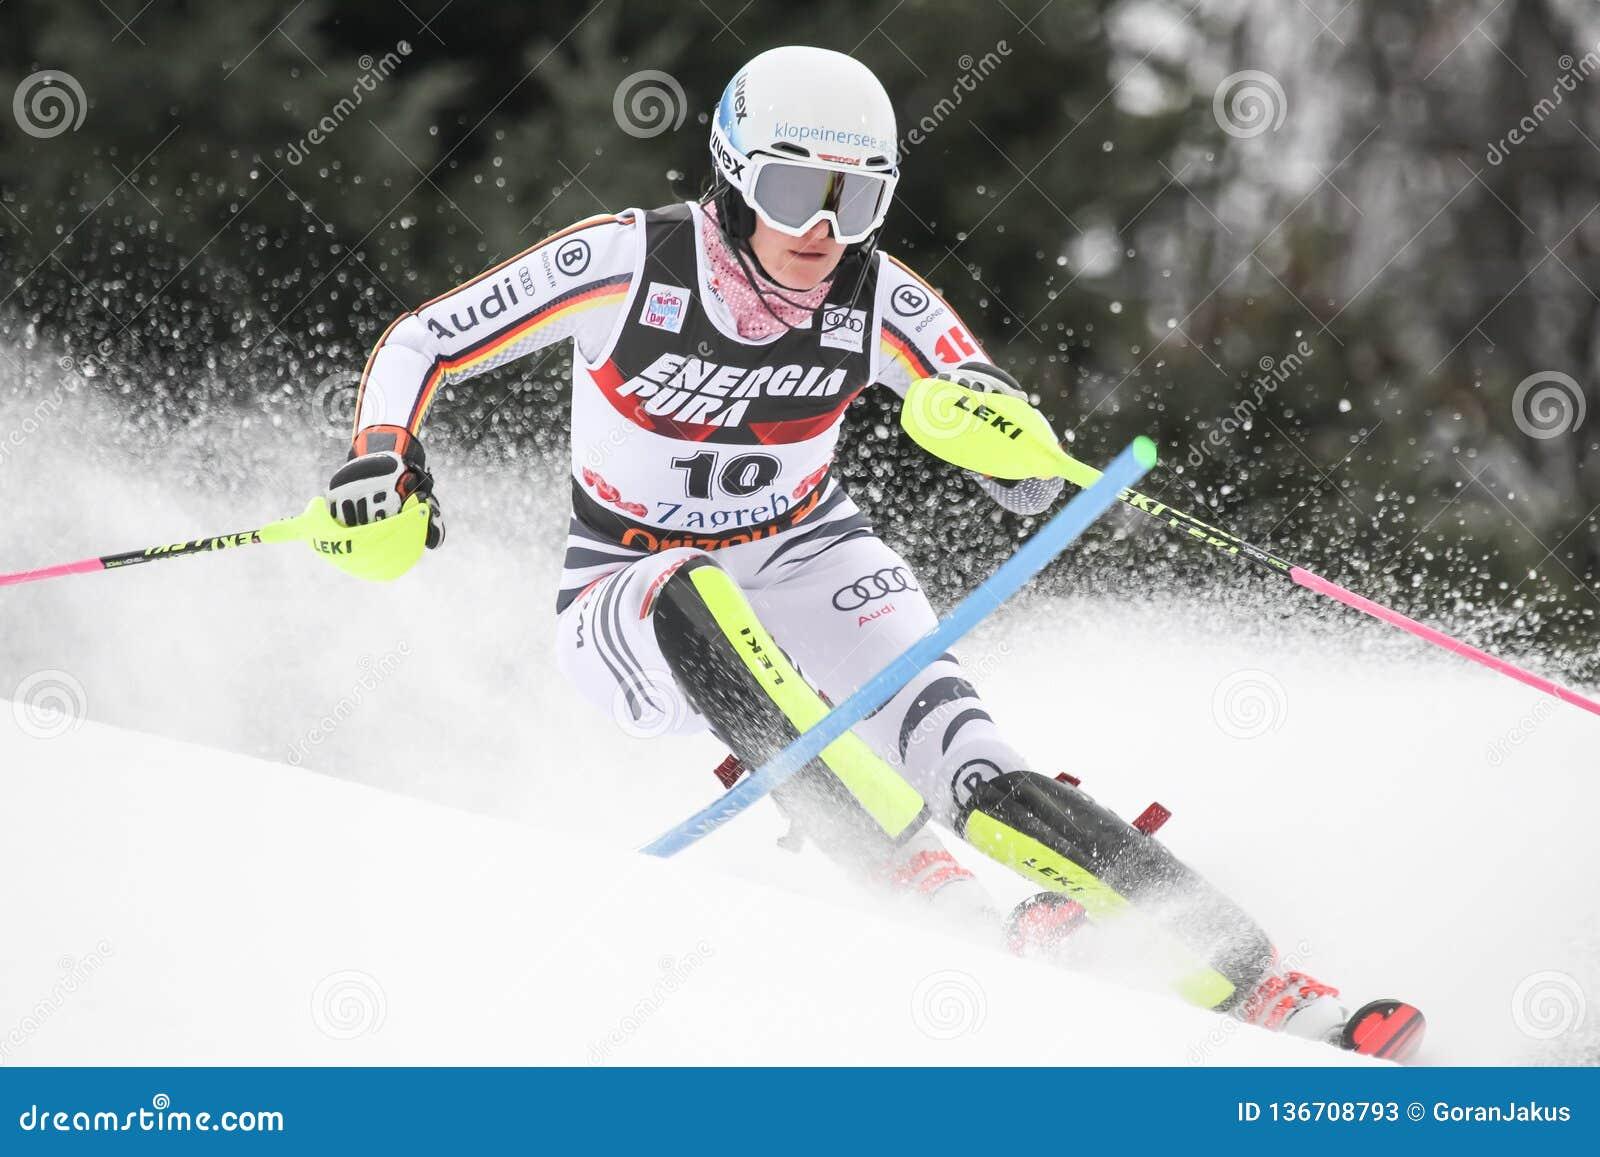 Sneeuw Koningin Trophy 2019 - Damesslalom